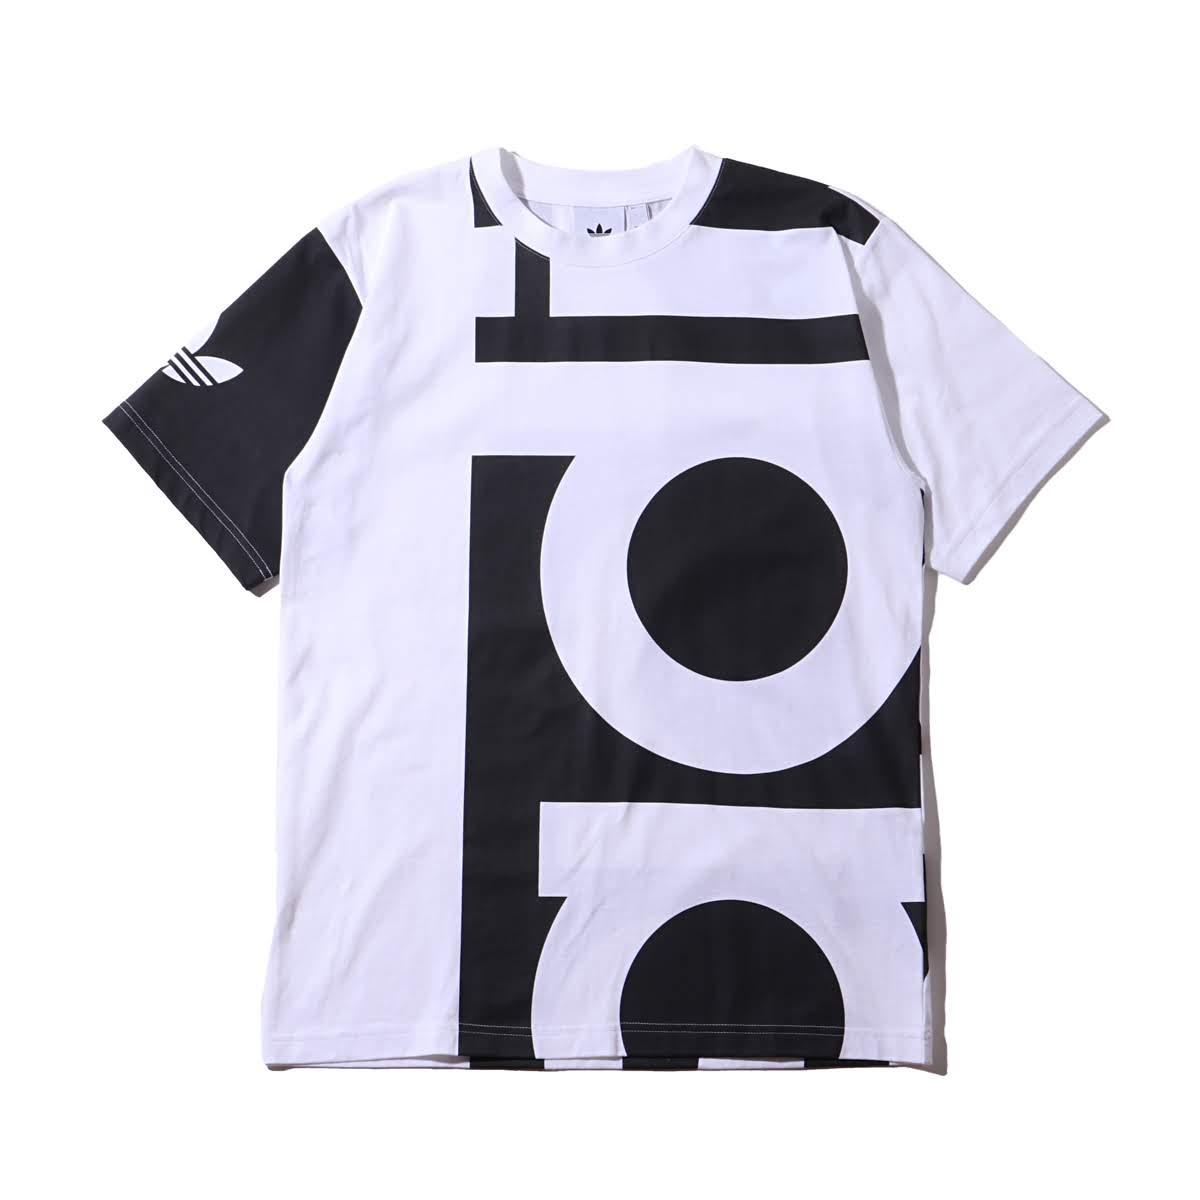 adidas Originals BIG ADI TEE (アディダスオリジナルスビッグアディティー) BLACKWHITE 19SS I